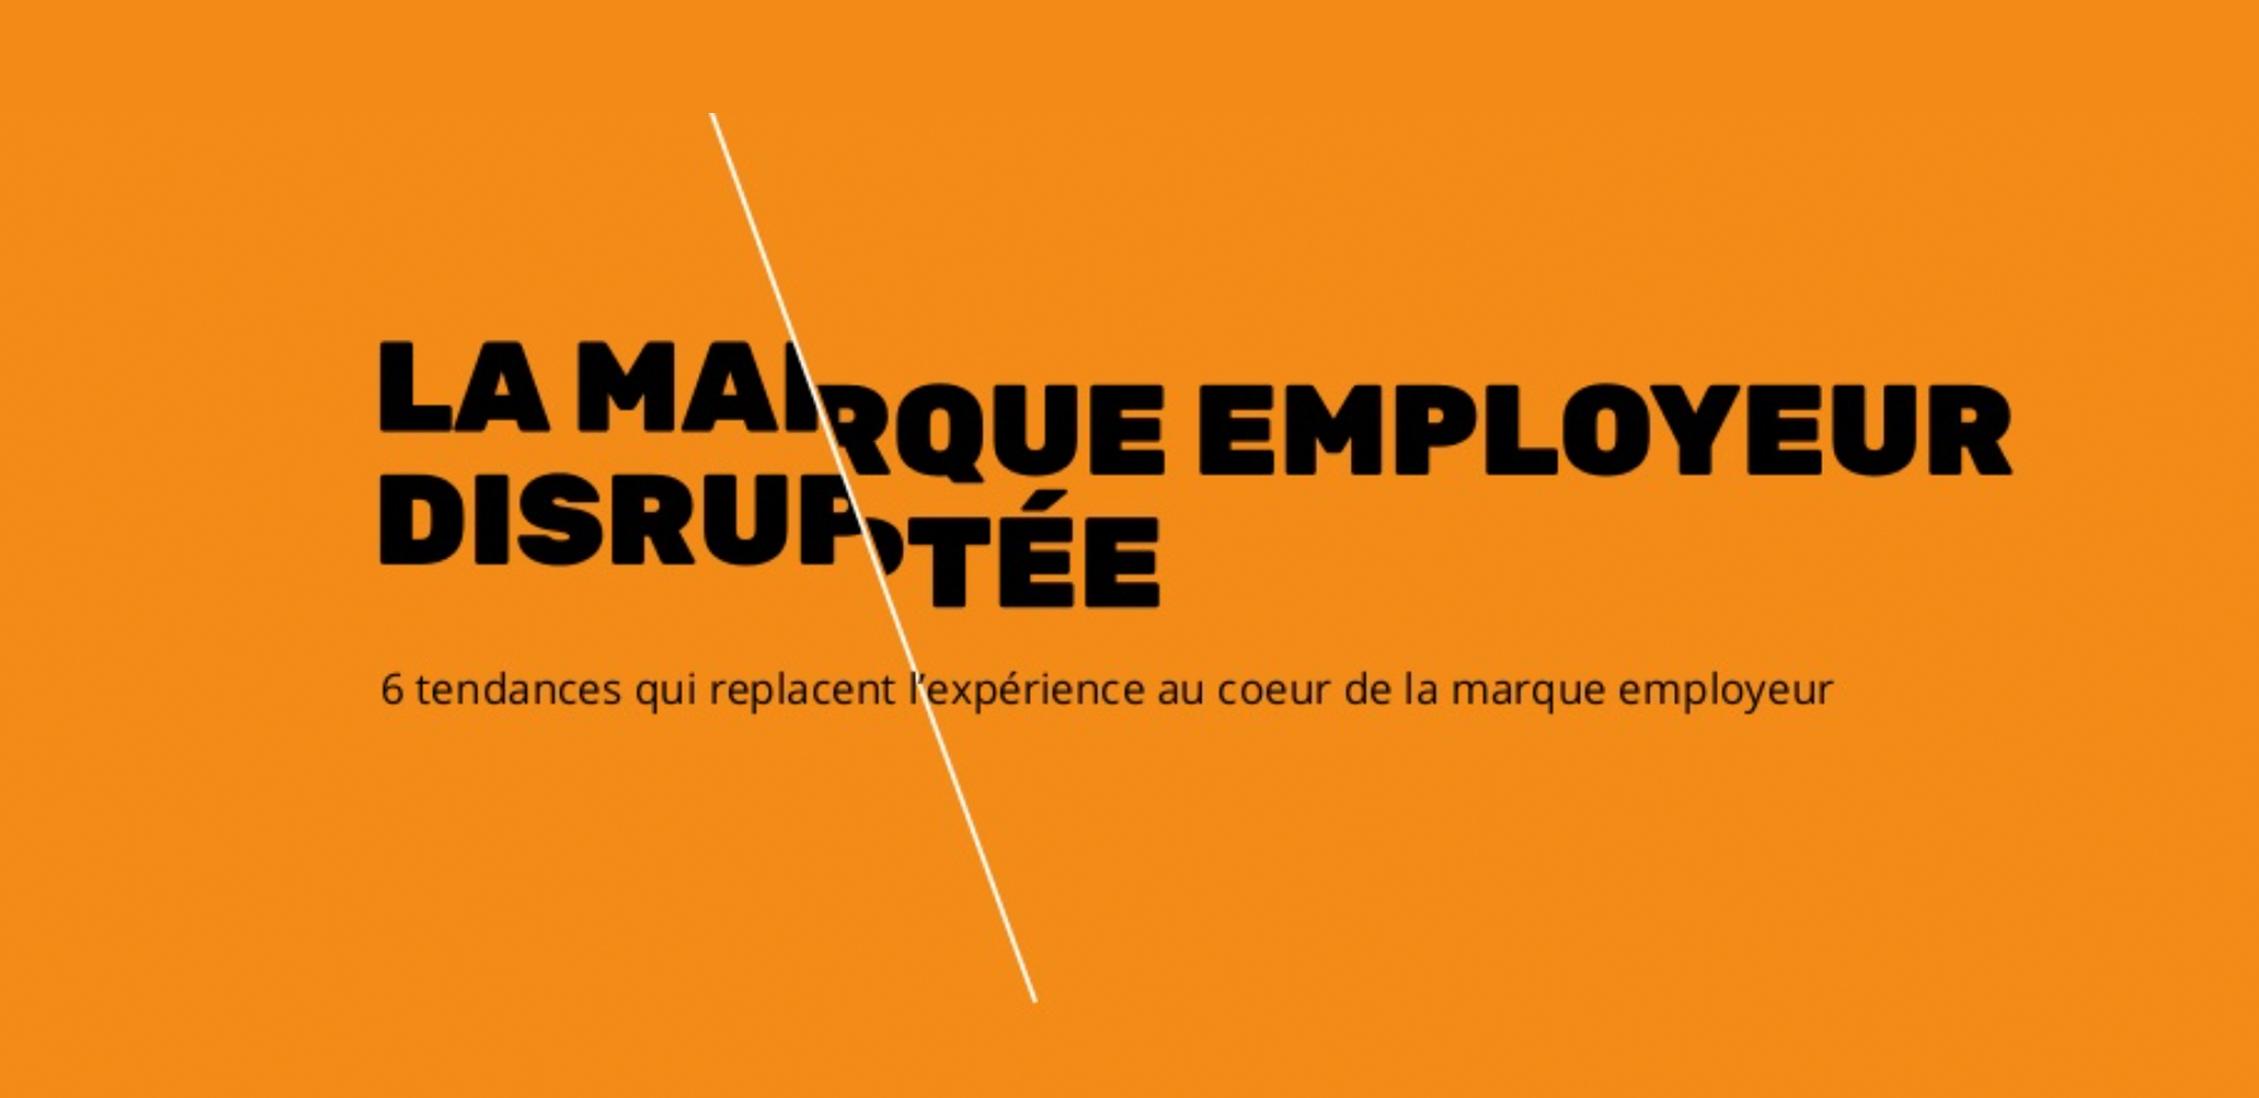 marque-employeur-image